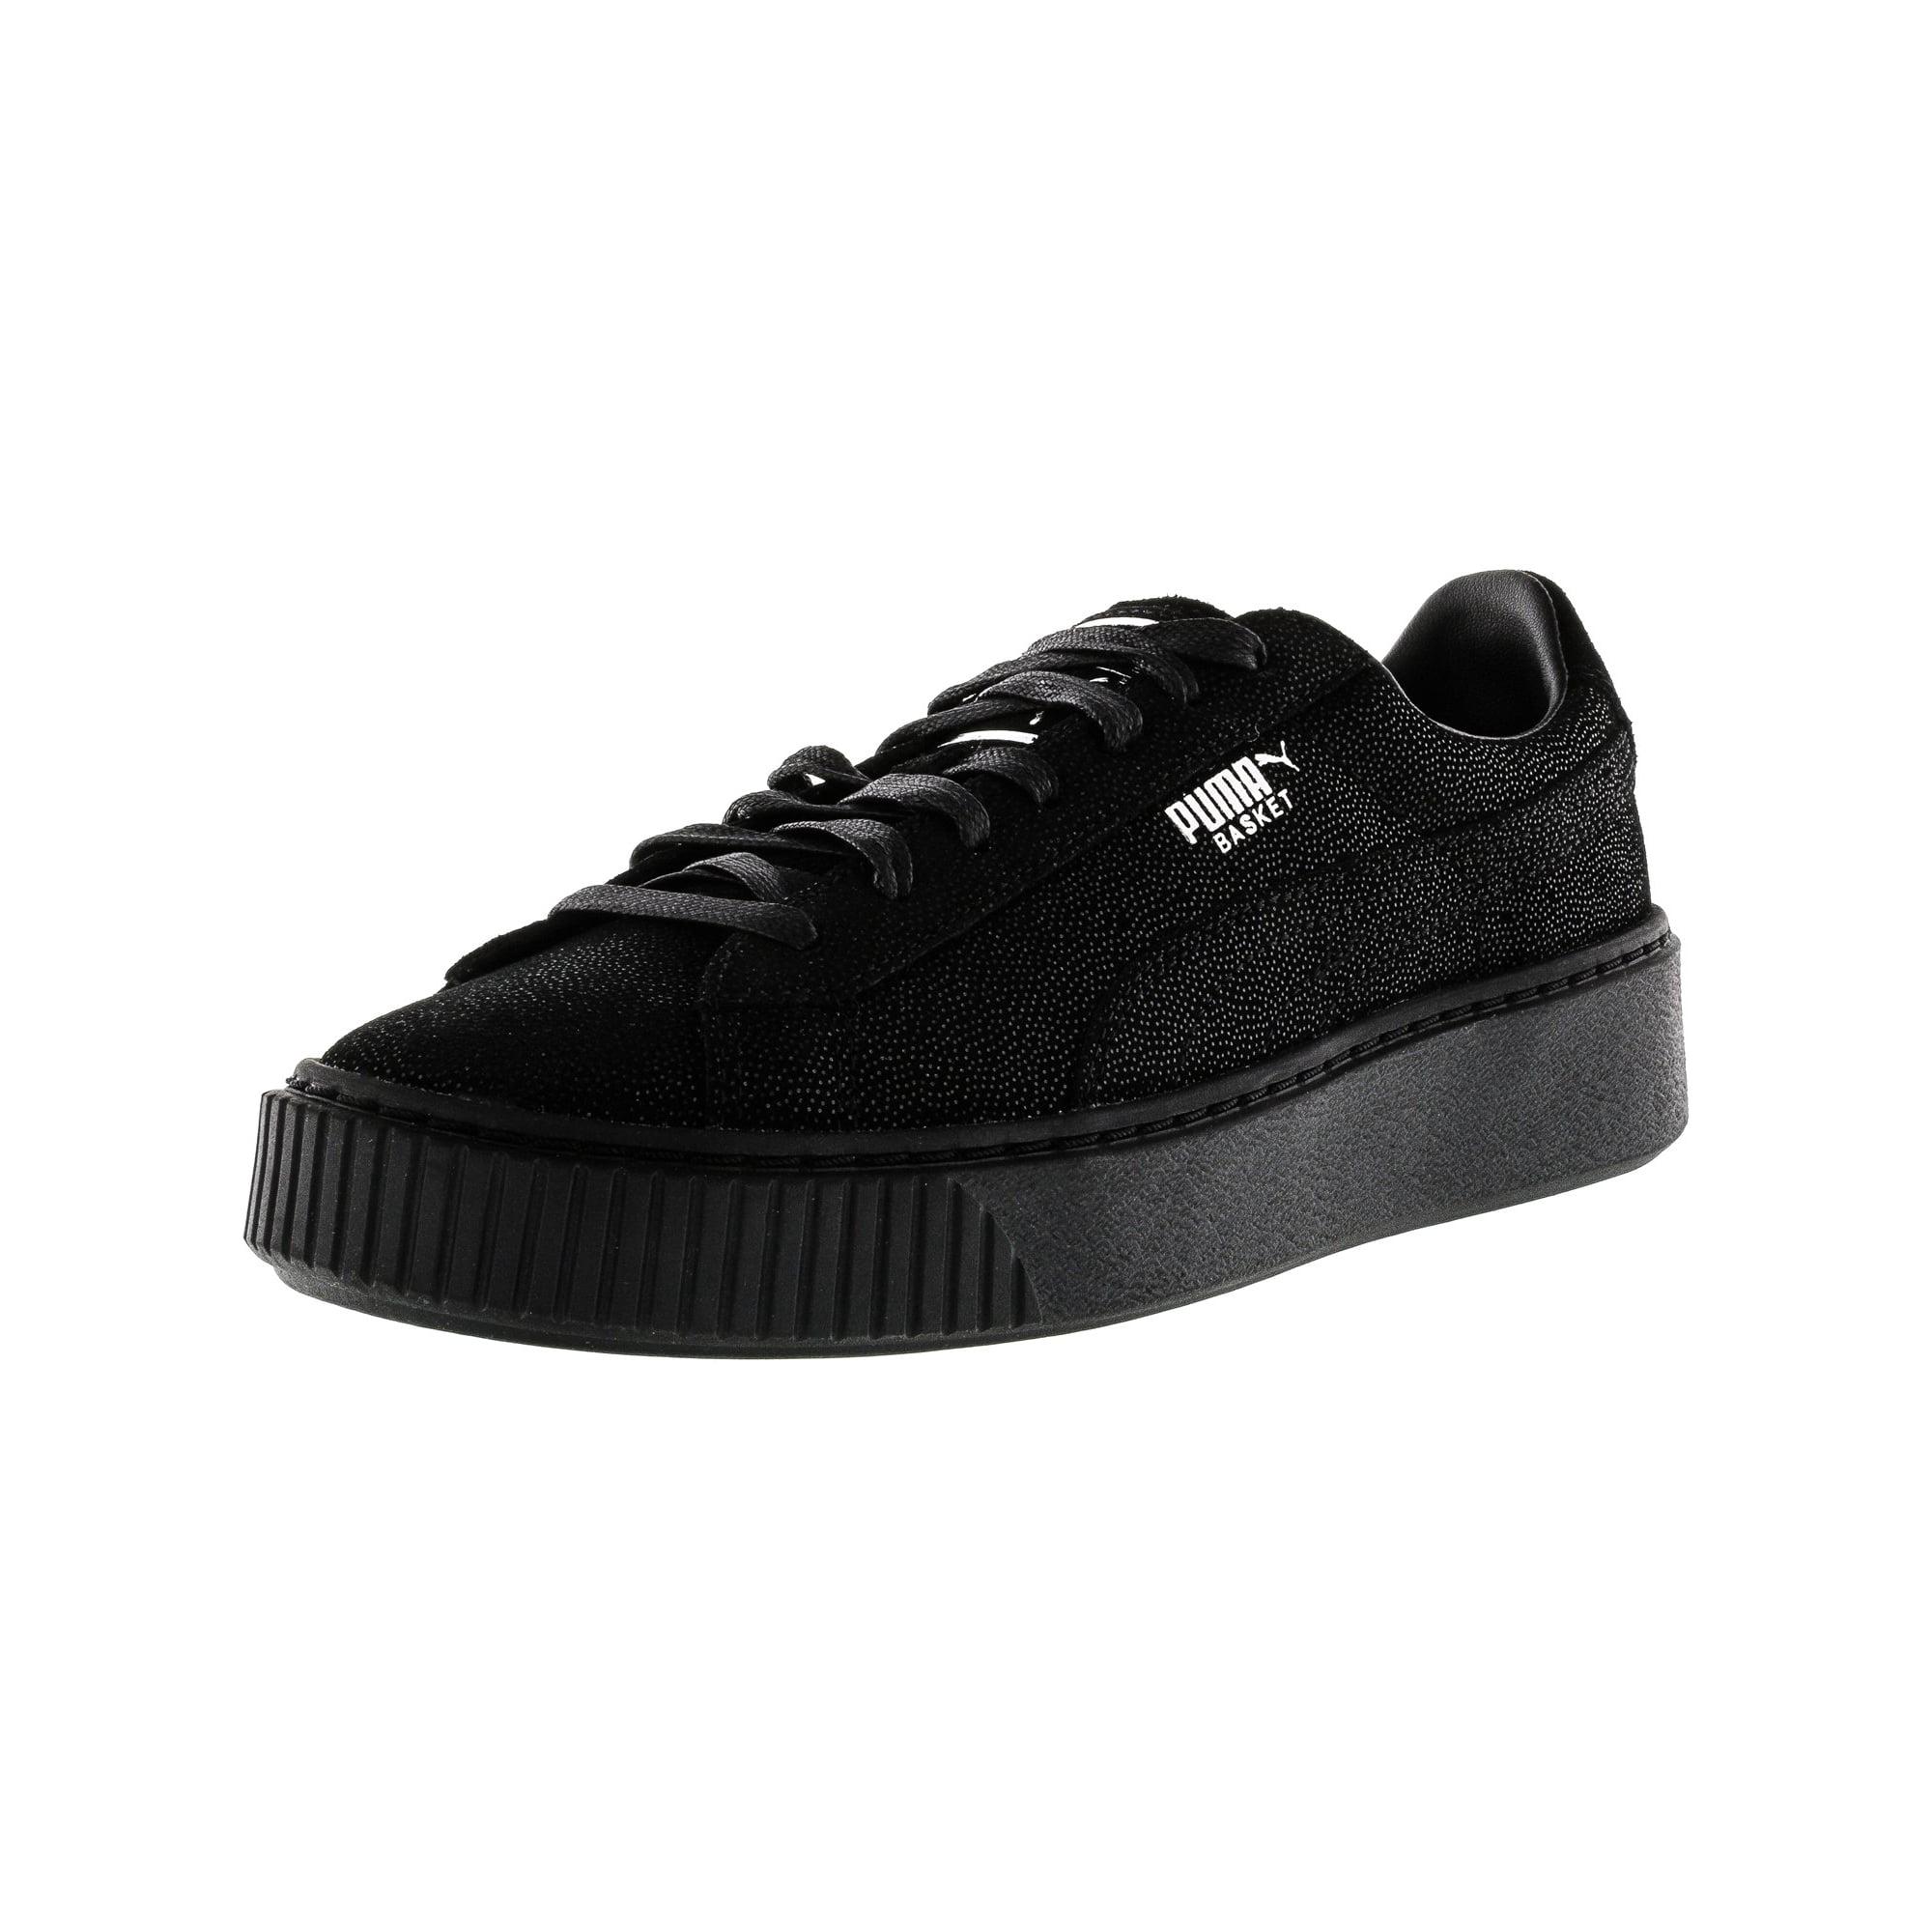 a1532ac637b4 Puma Women s Basket Platform Reset Black   Ankle-High Fashion Sneaker - 8M